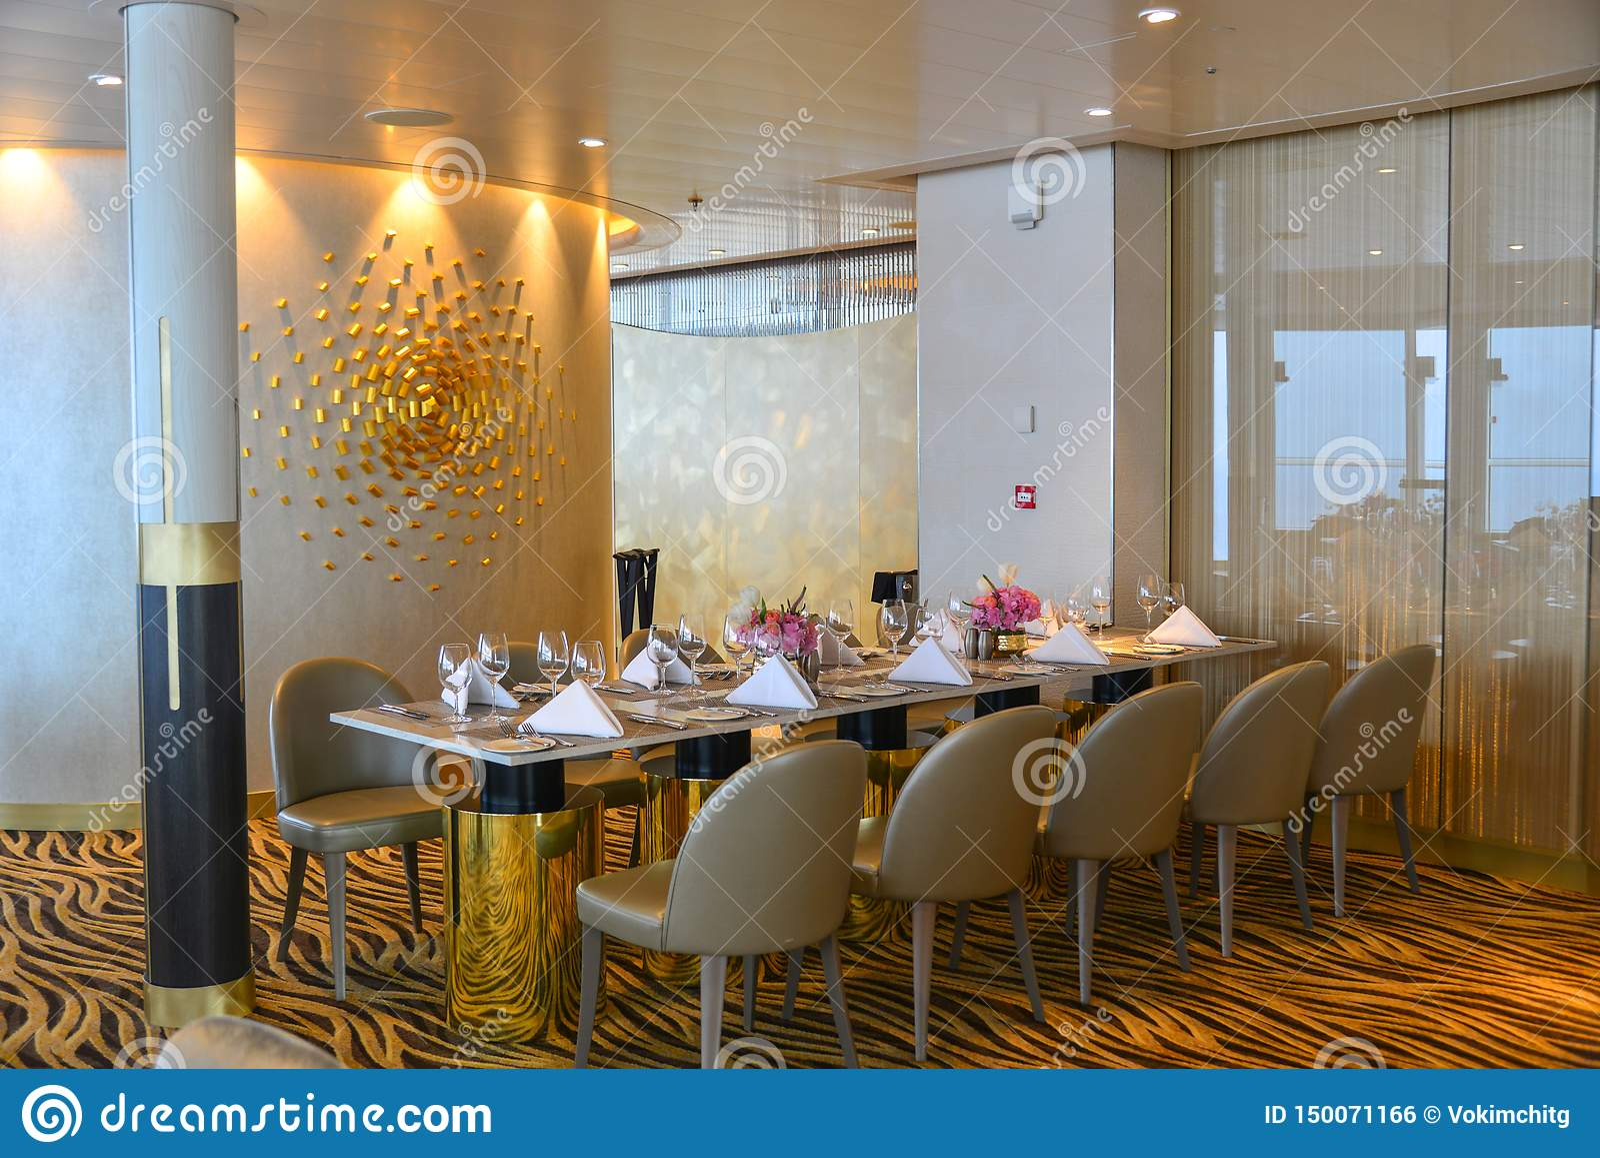 High Class Luxury Restaurant Interior Stock Photo Image Of Interior Cutlery 150071166